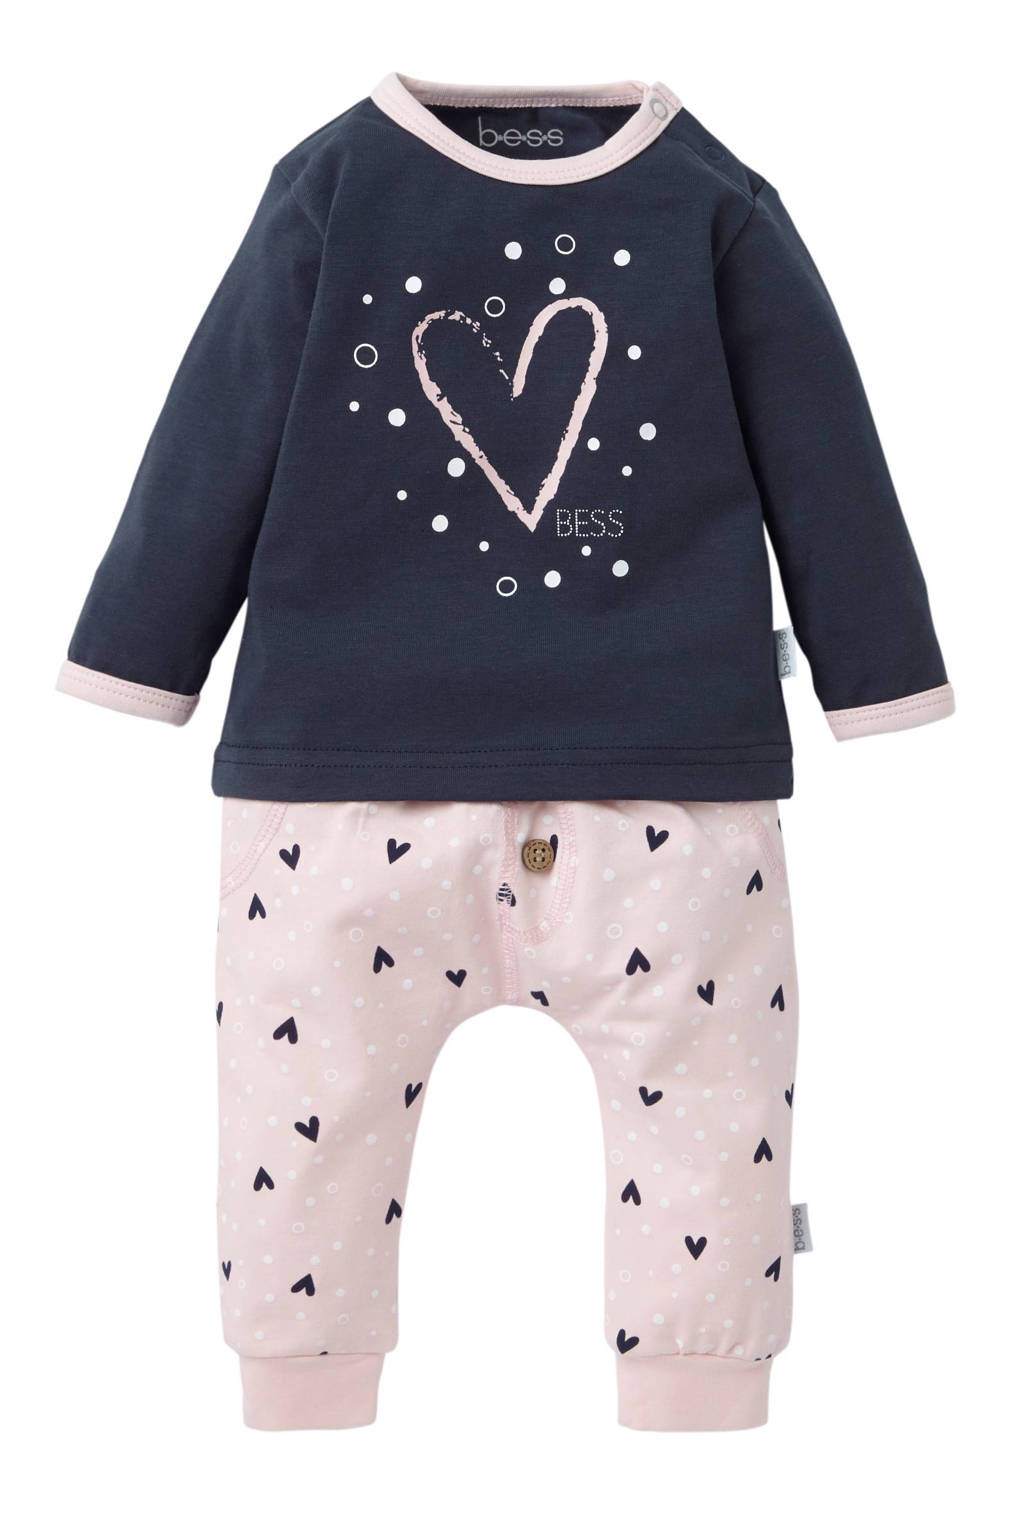 B.E.S.S gifset newborn baby set, Roze